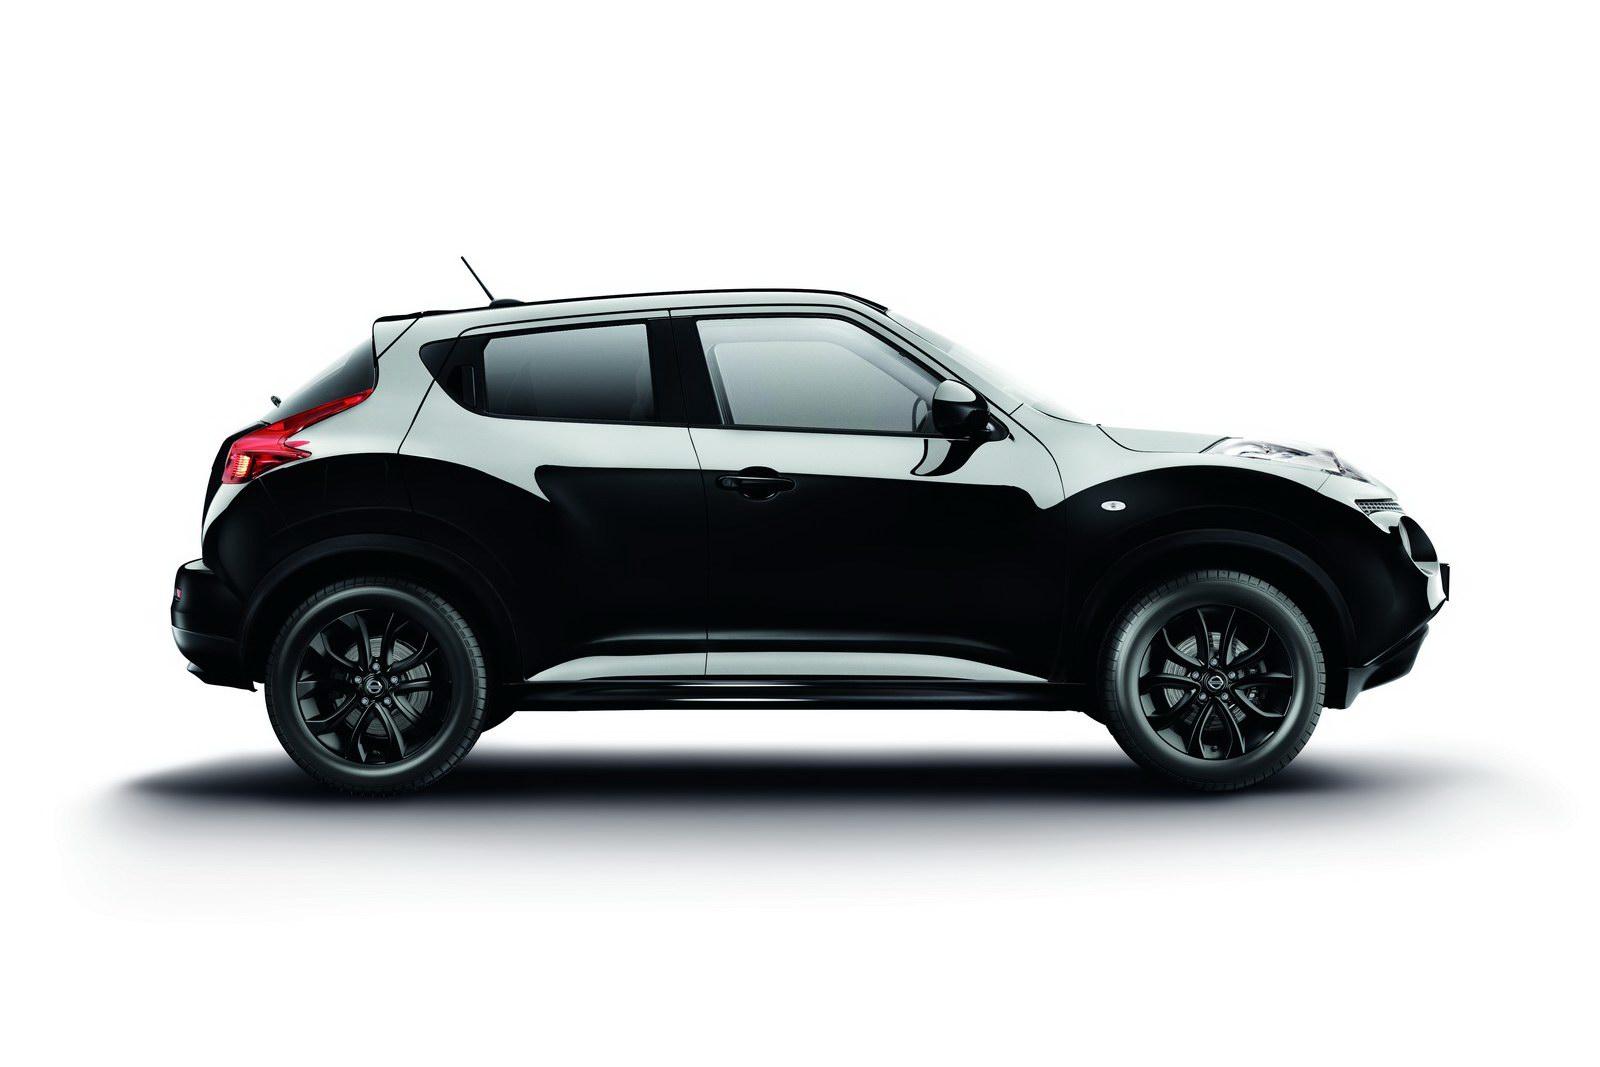 Kuro A New Version Of Nissan Juke 2013 Car